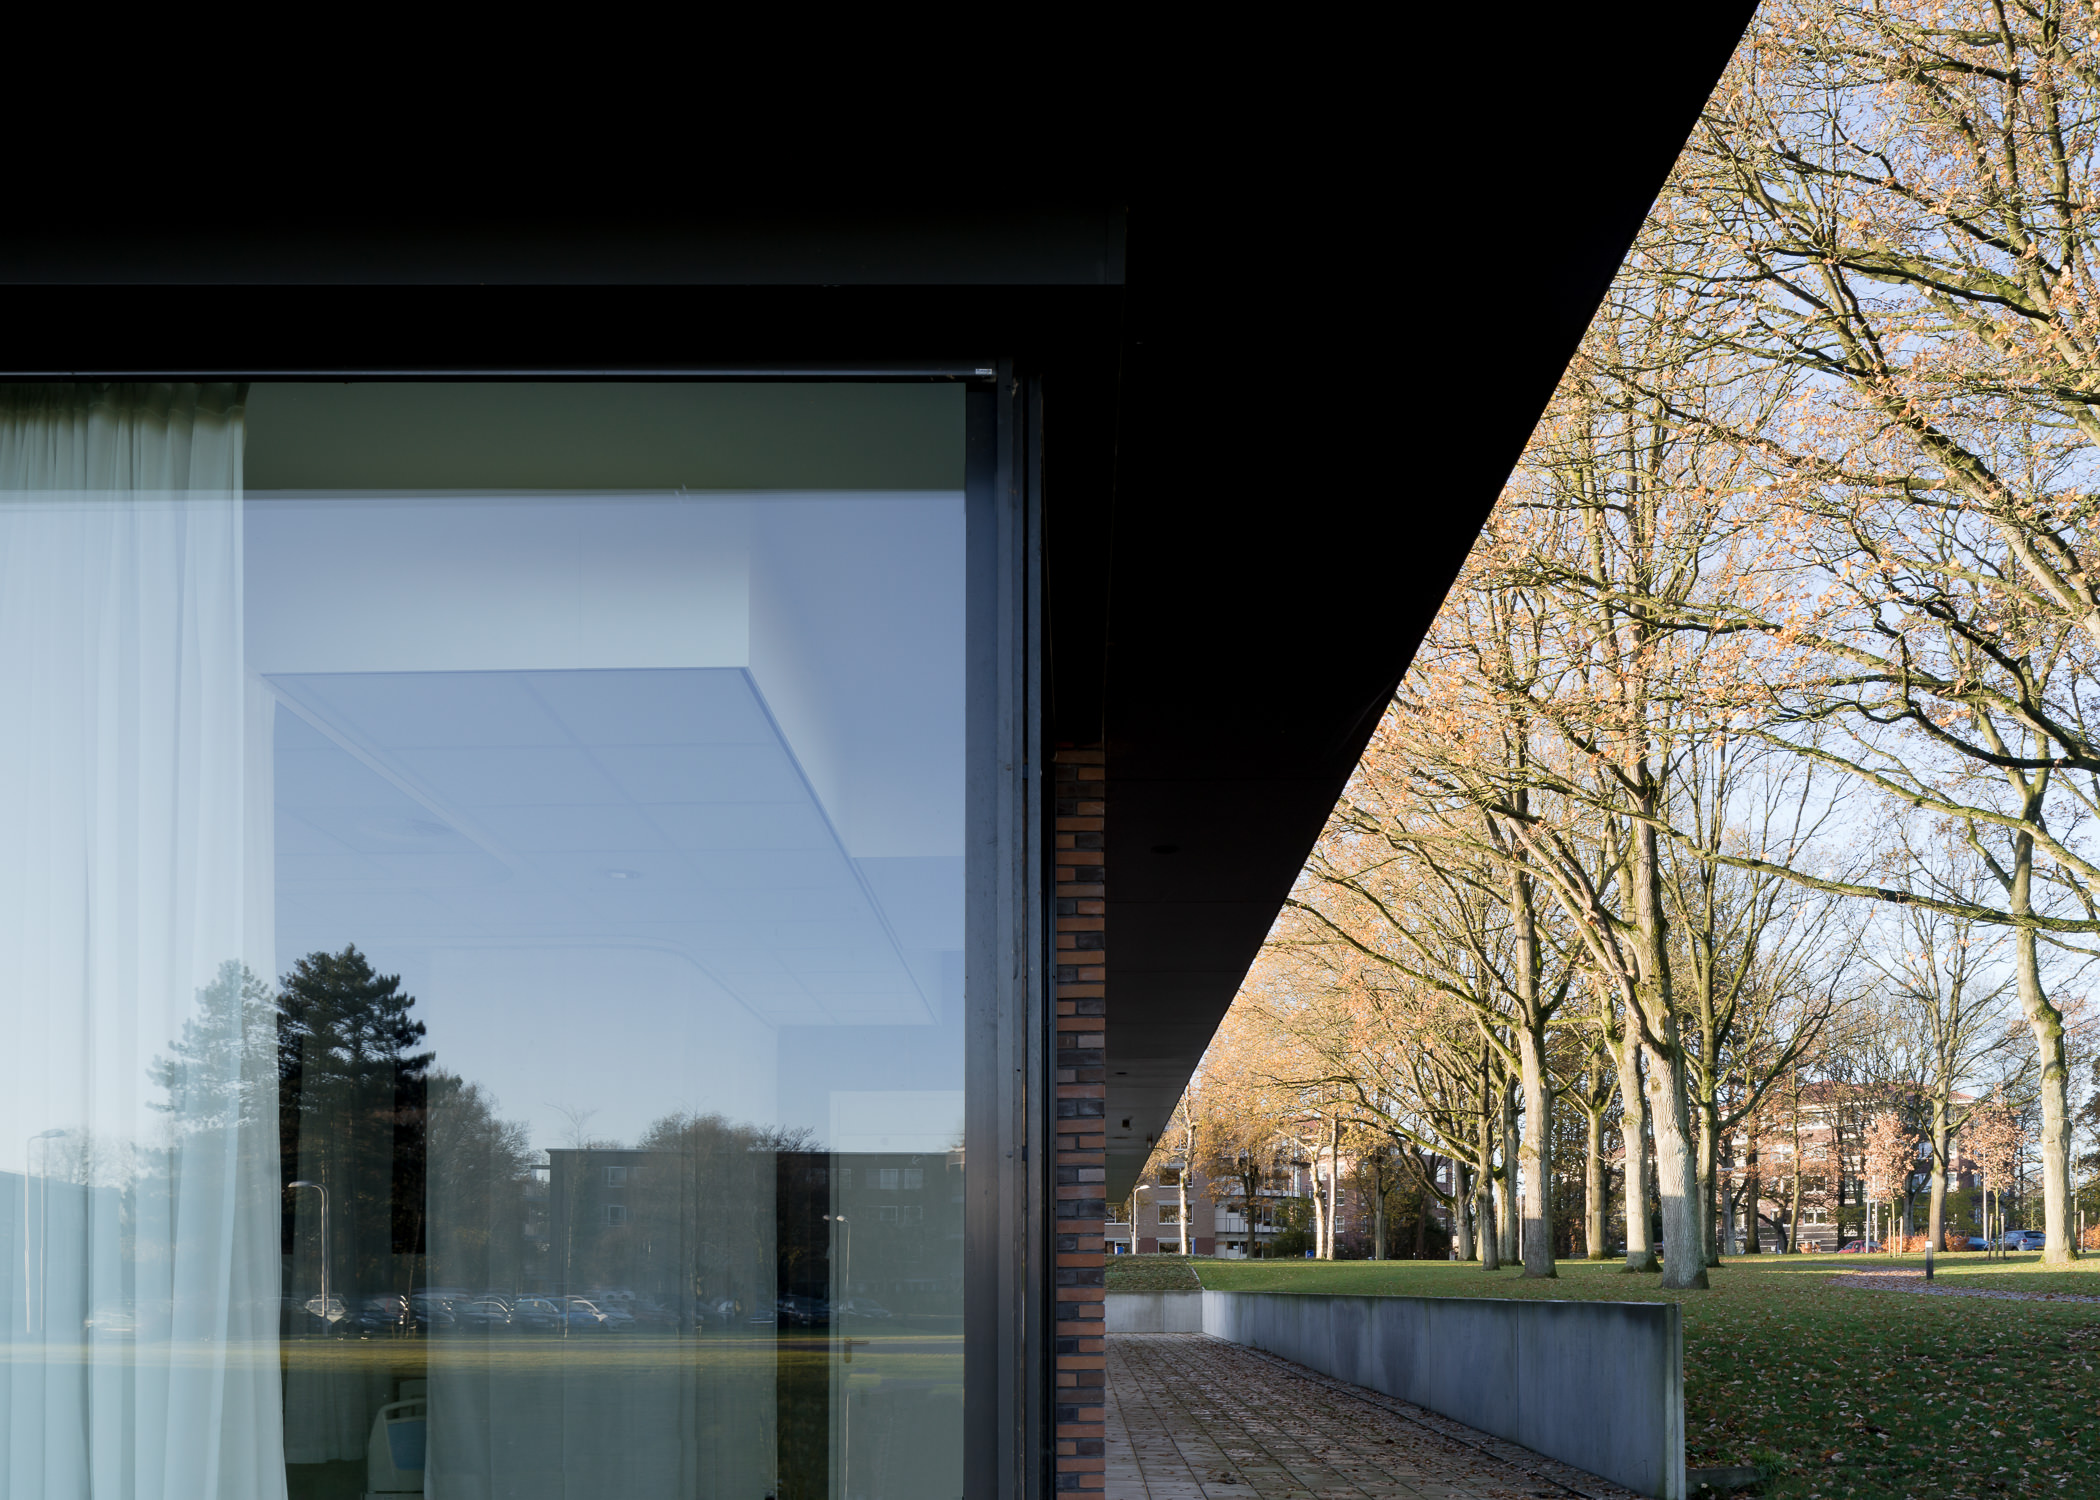 team-4-groningen-haren-beatrixoord-mark-hadden-amsterdam-architecture-photographer-architectuurfotograaf-040.jpg